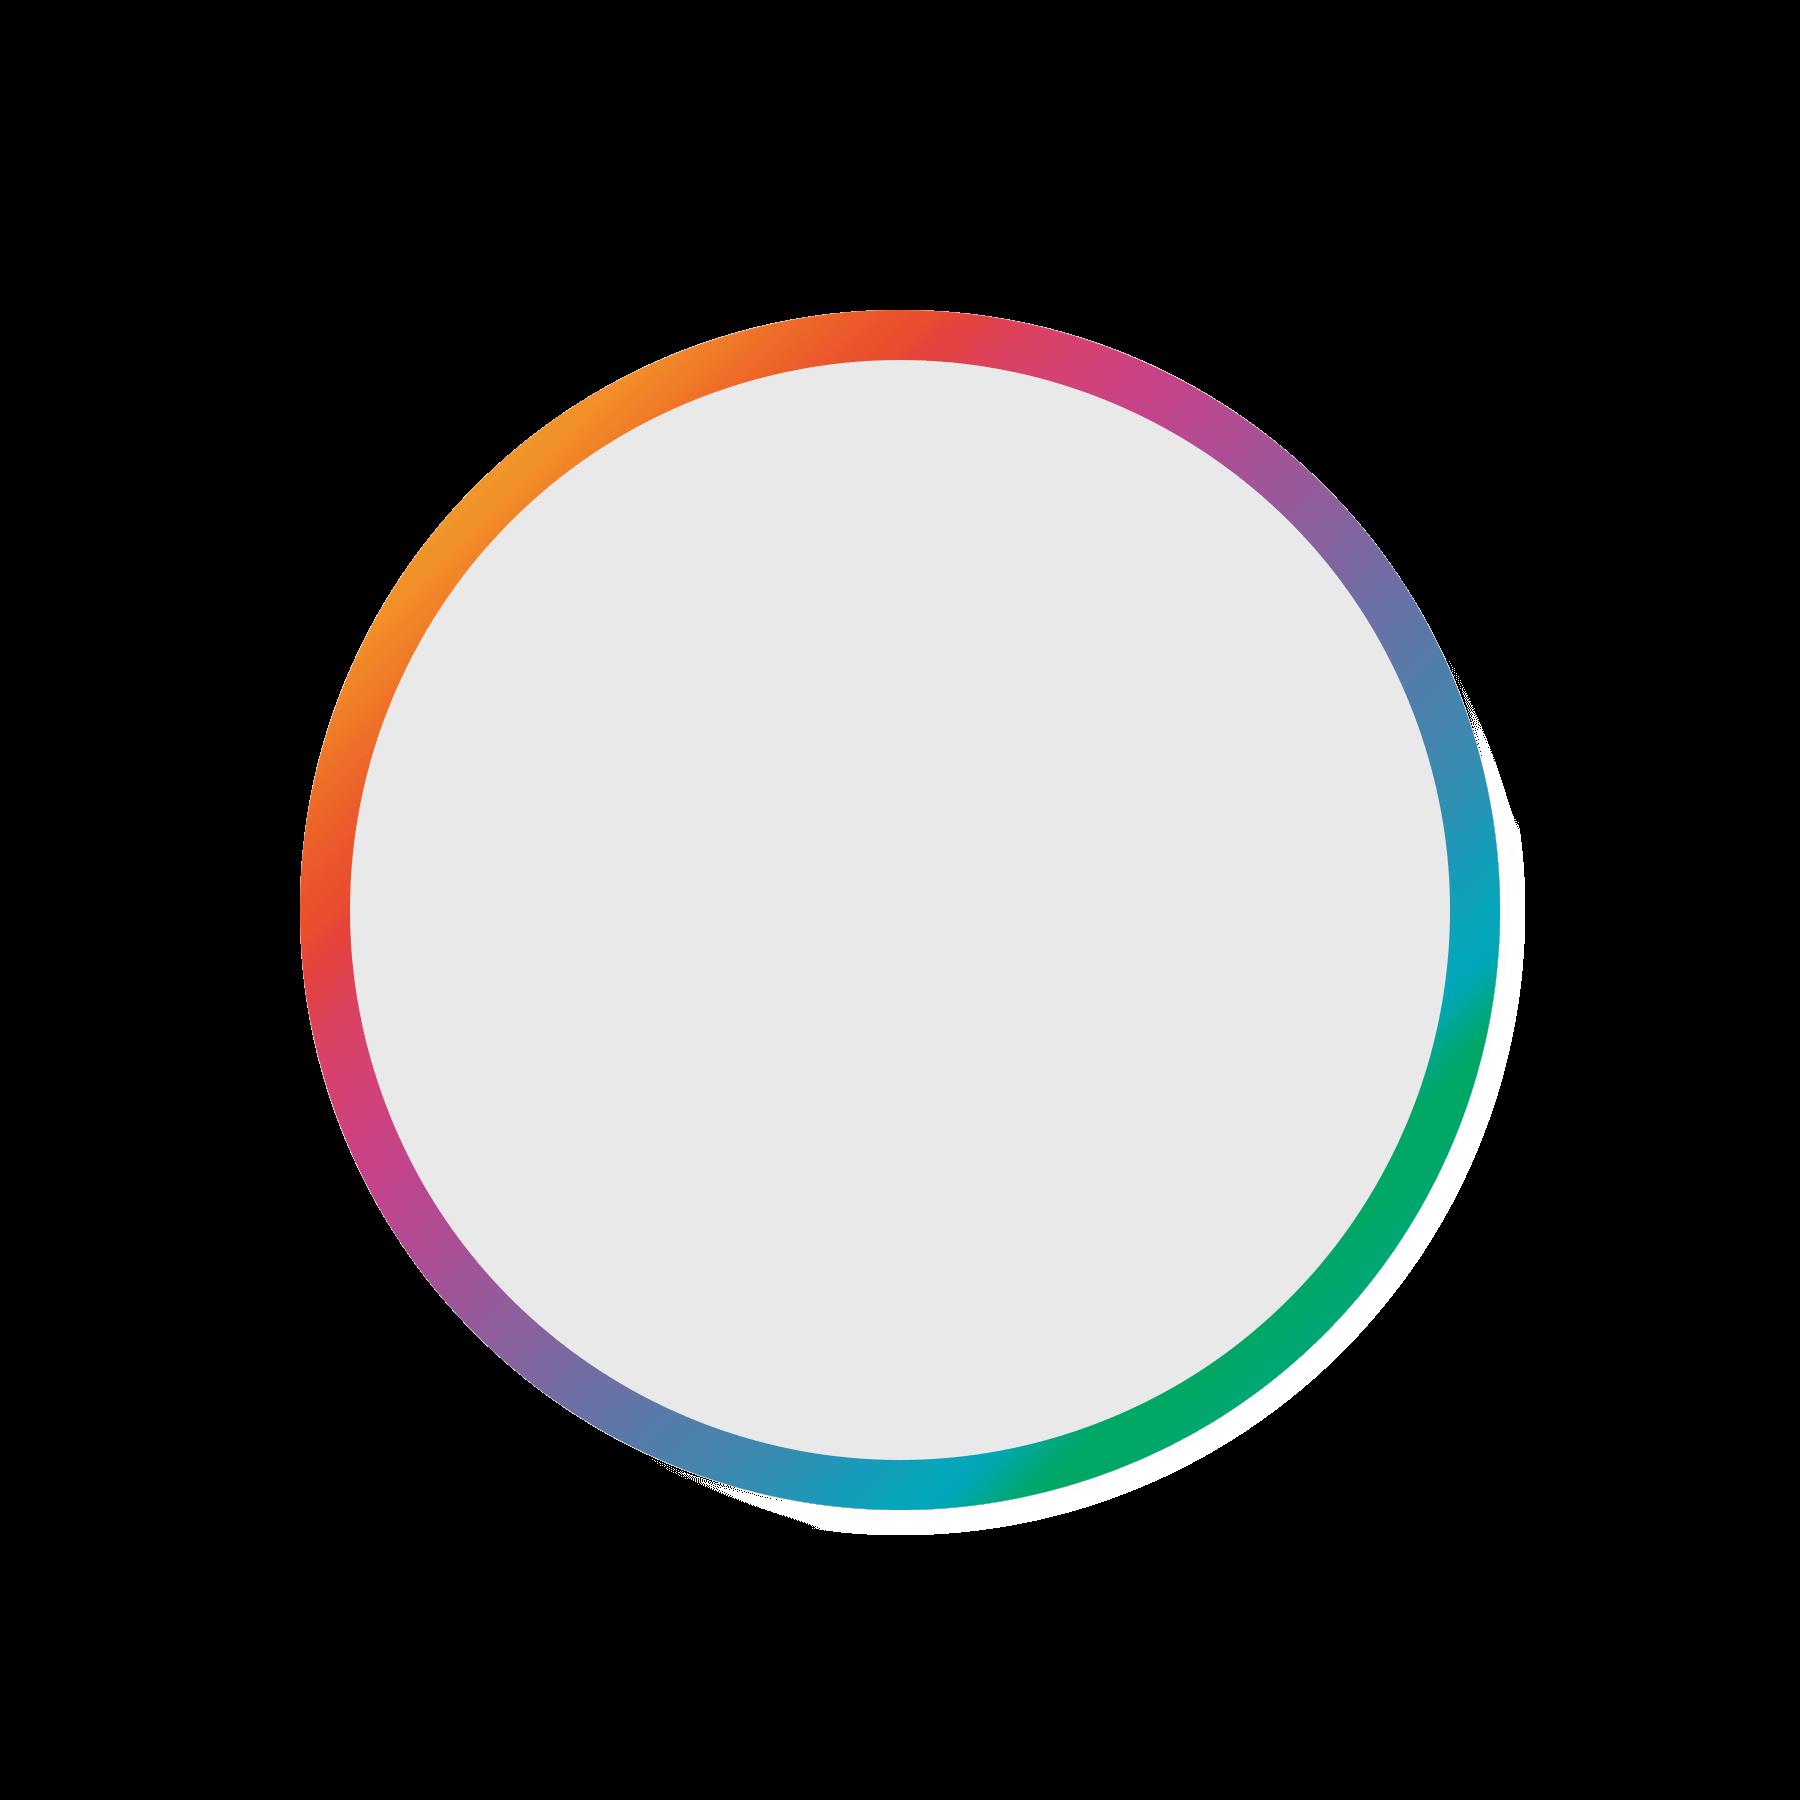 Logitech G Pro Gaming-Maus